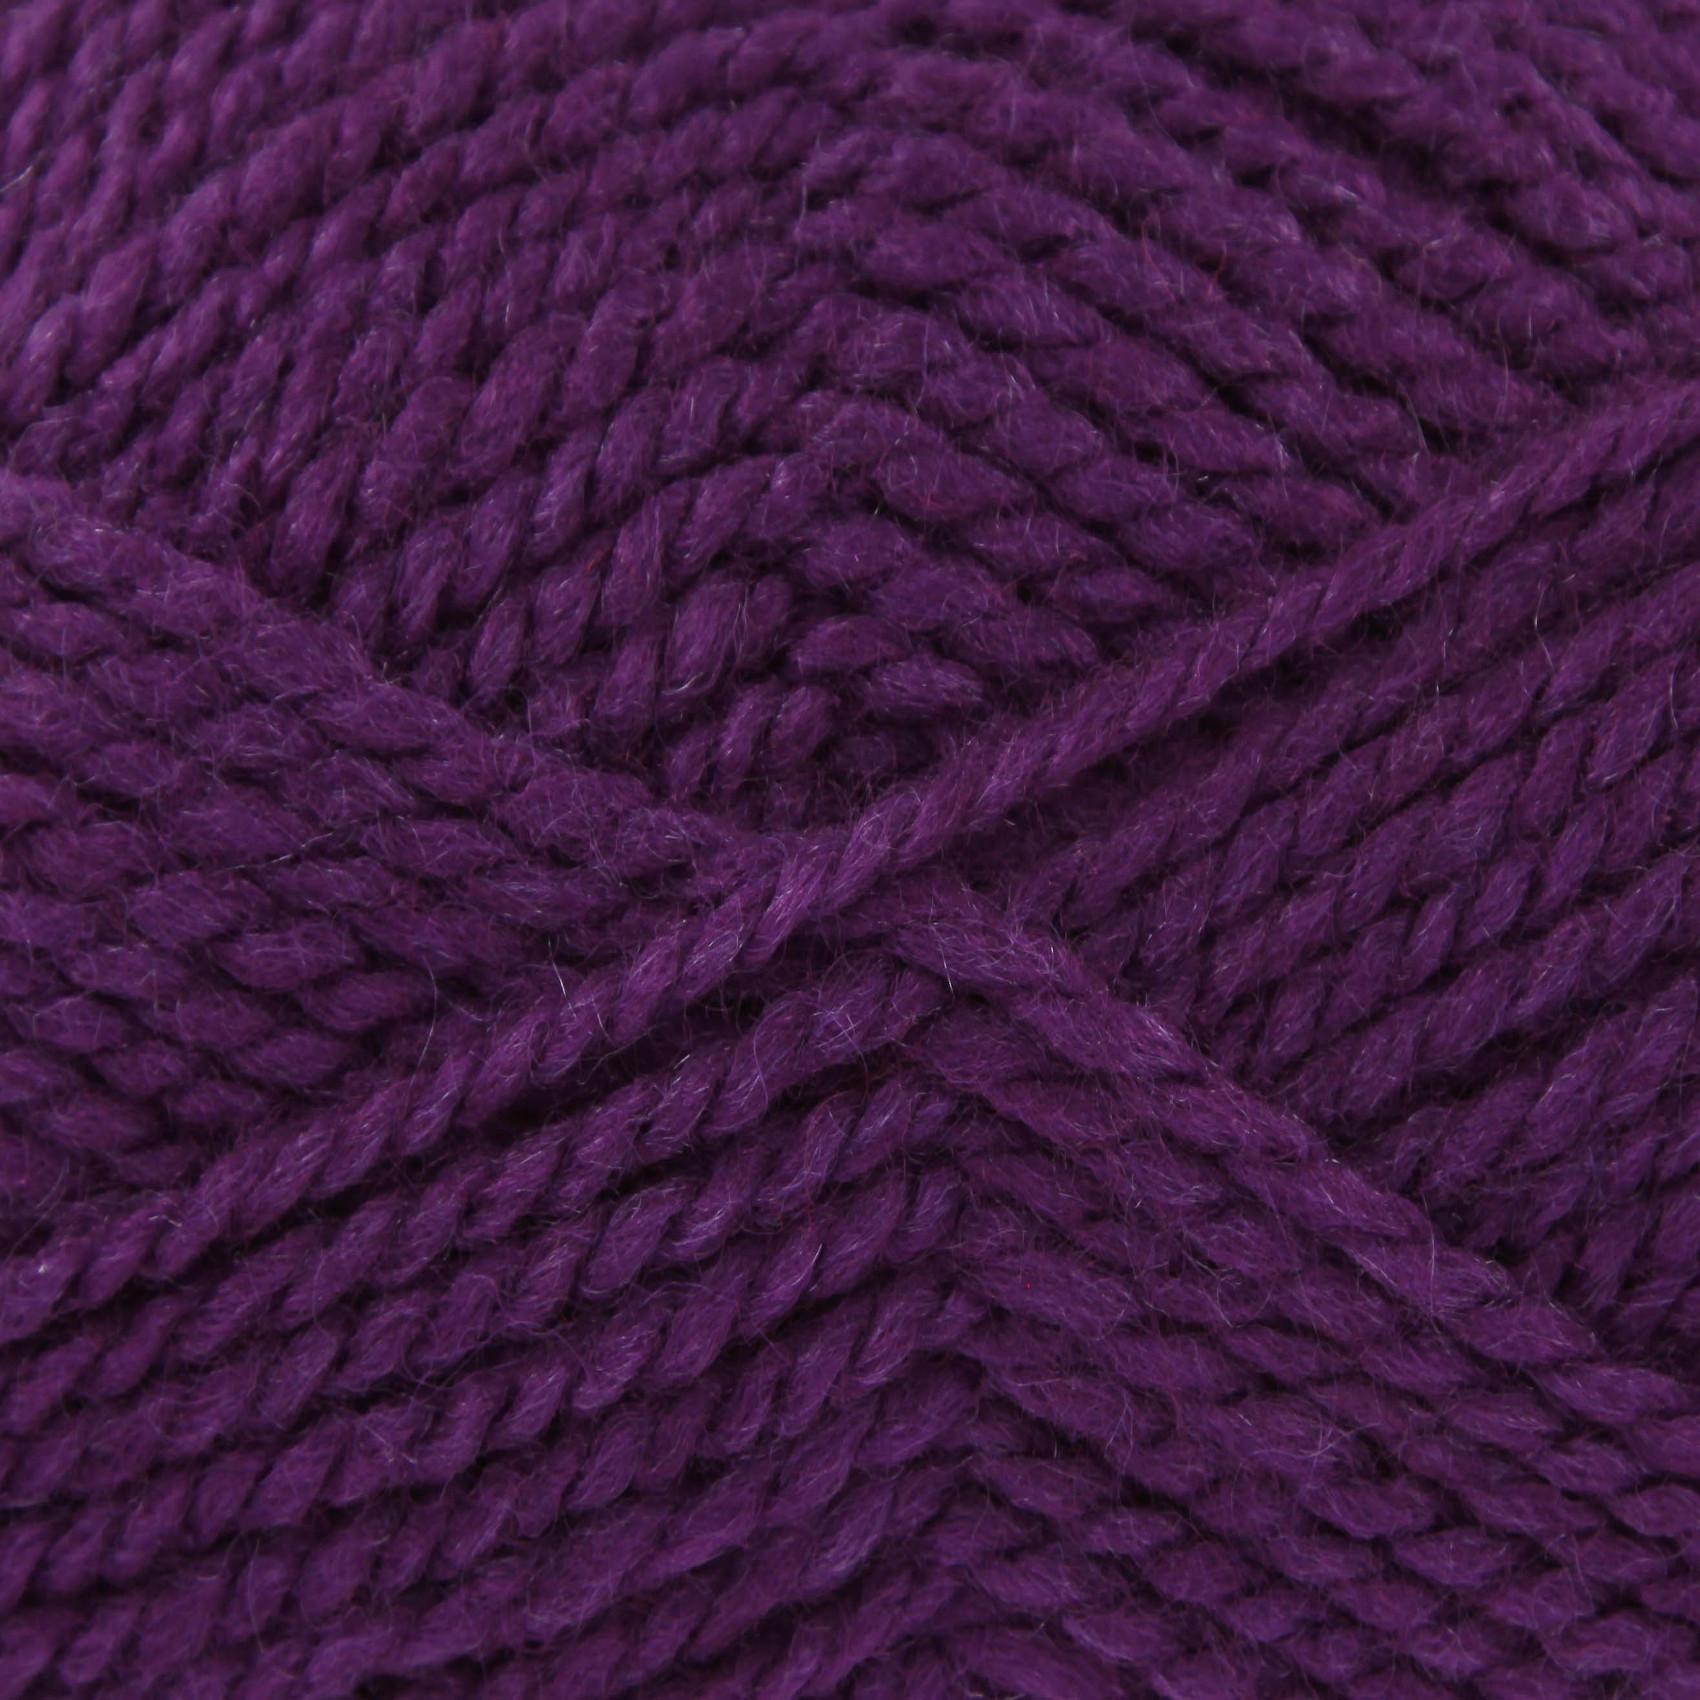 Knitting Wool Uk Only : G ball magnum chunky knitting craft yarn king cole soft